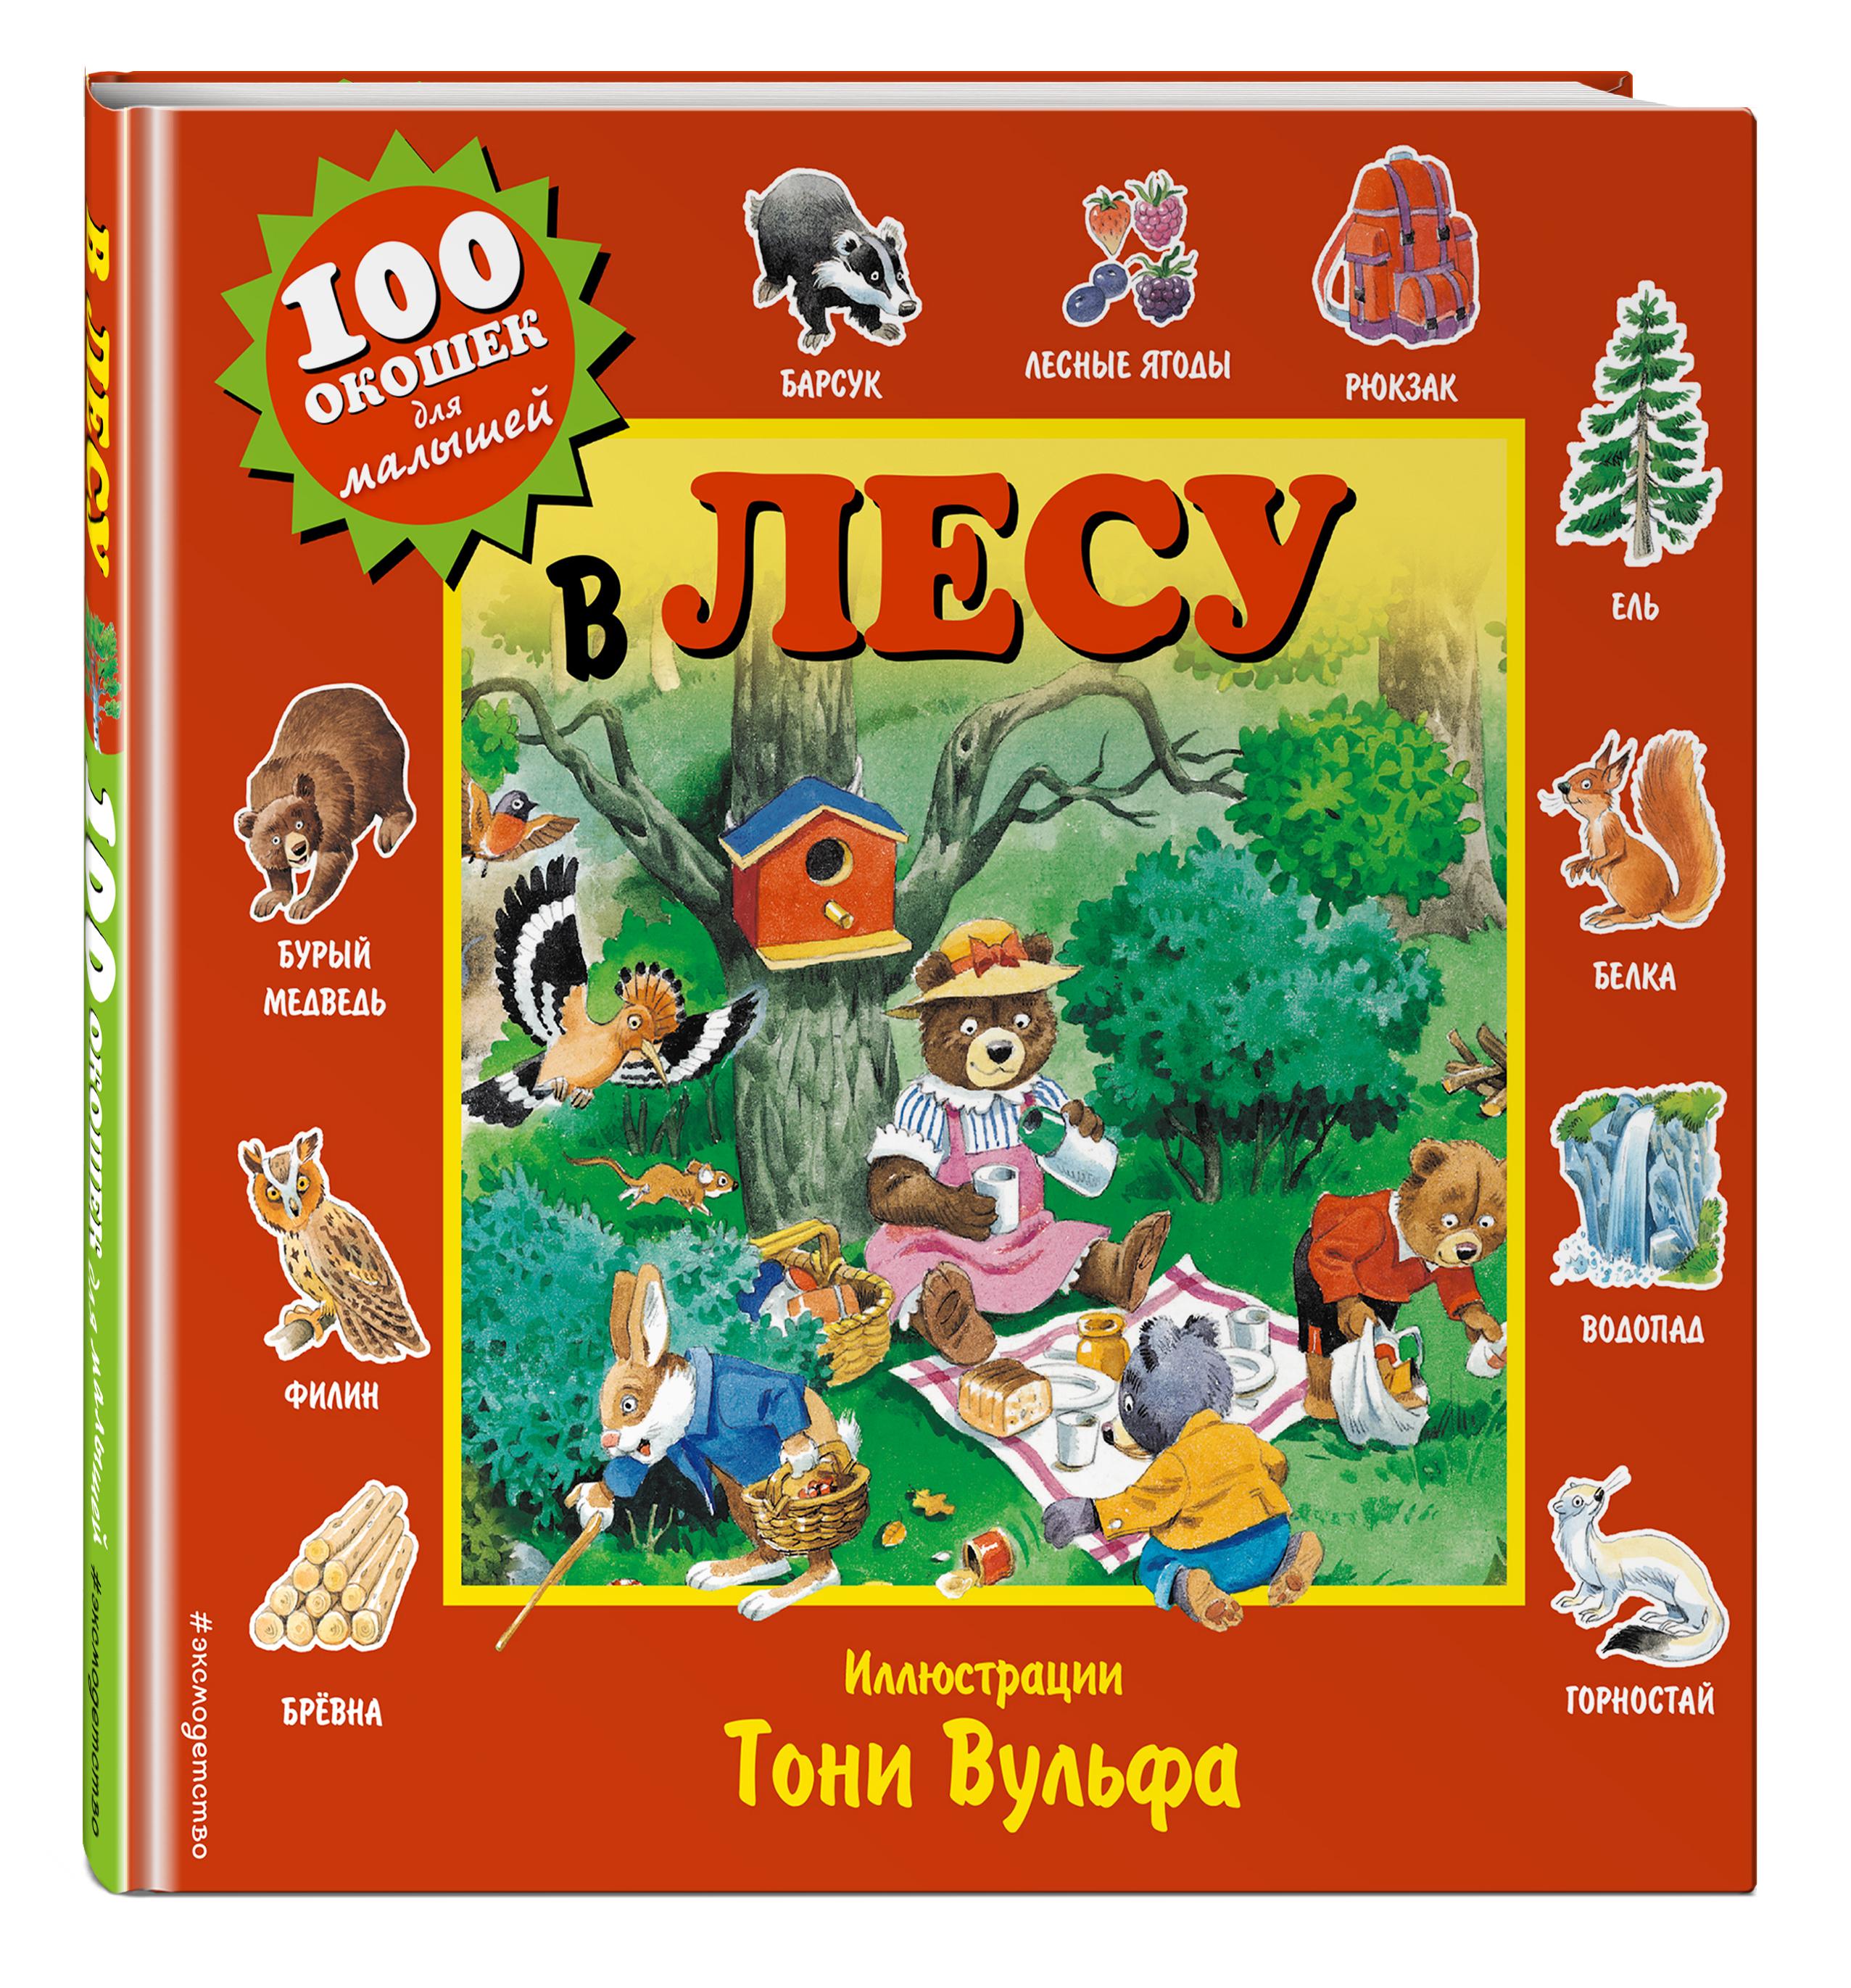 В лесу ISBN: 978-5-699-80210-4